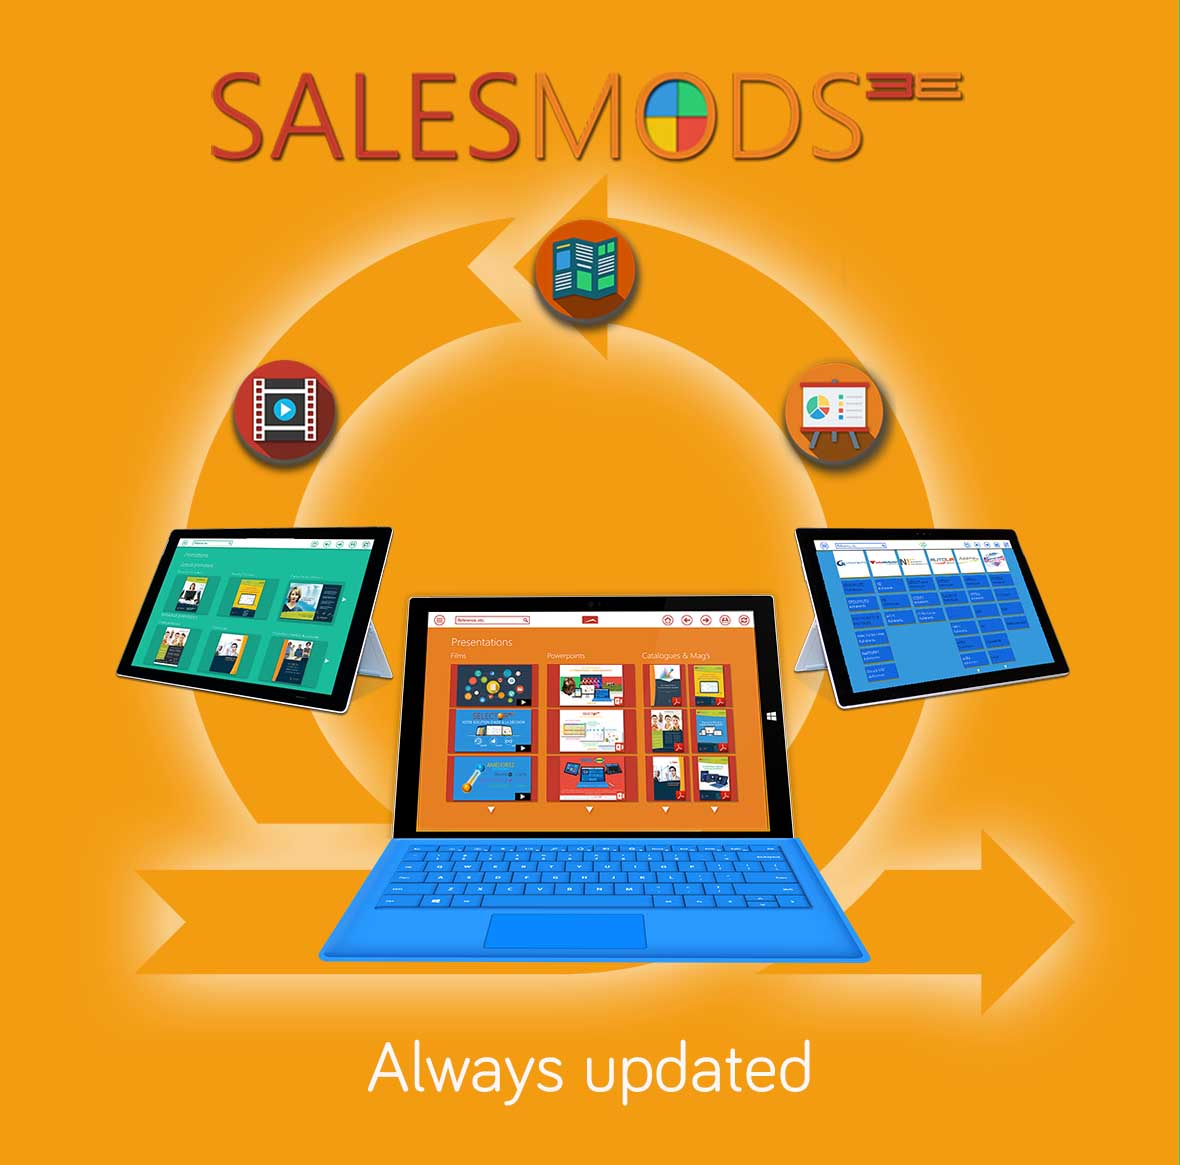 More information about The Digital Asset Management - modul of SalesMods 3E:  Present efficiently your présentations, films, catalogues, brochures, promotions, etc.